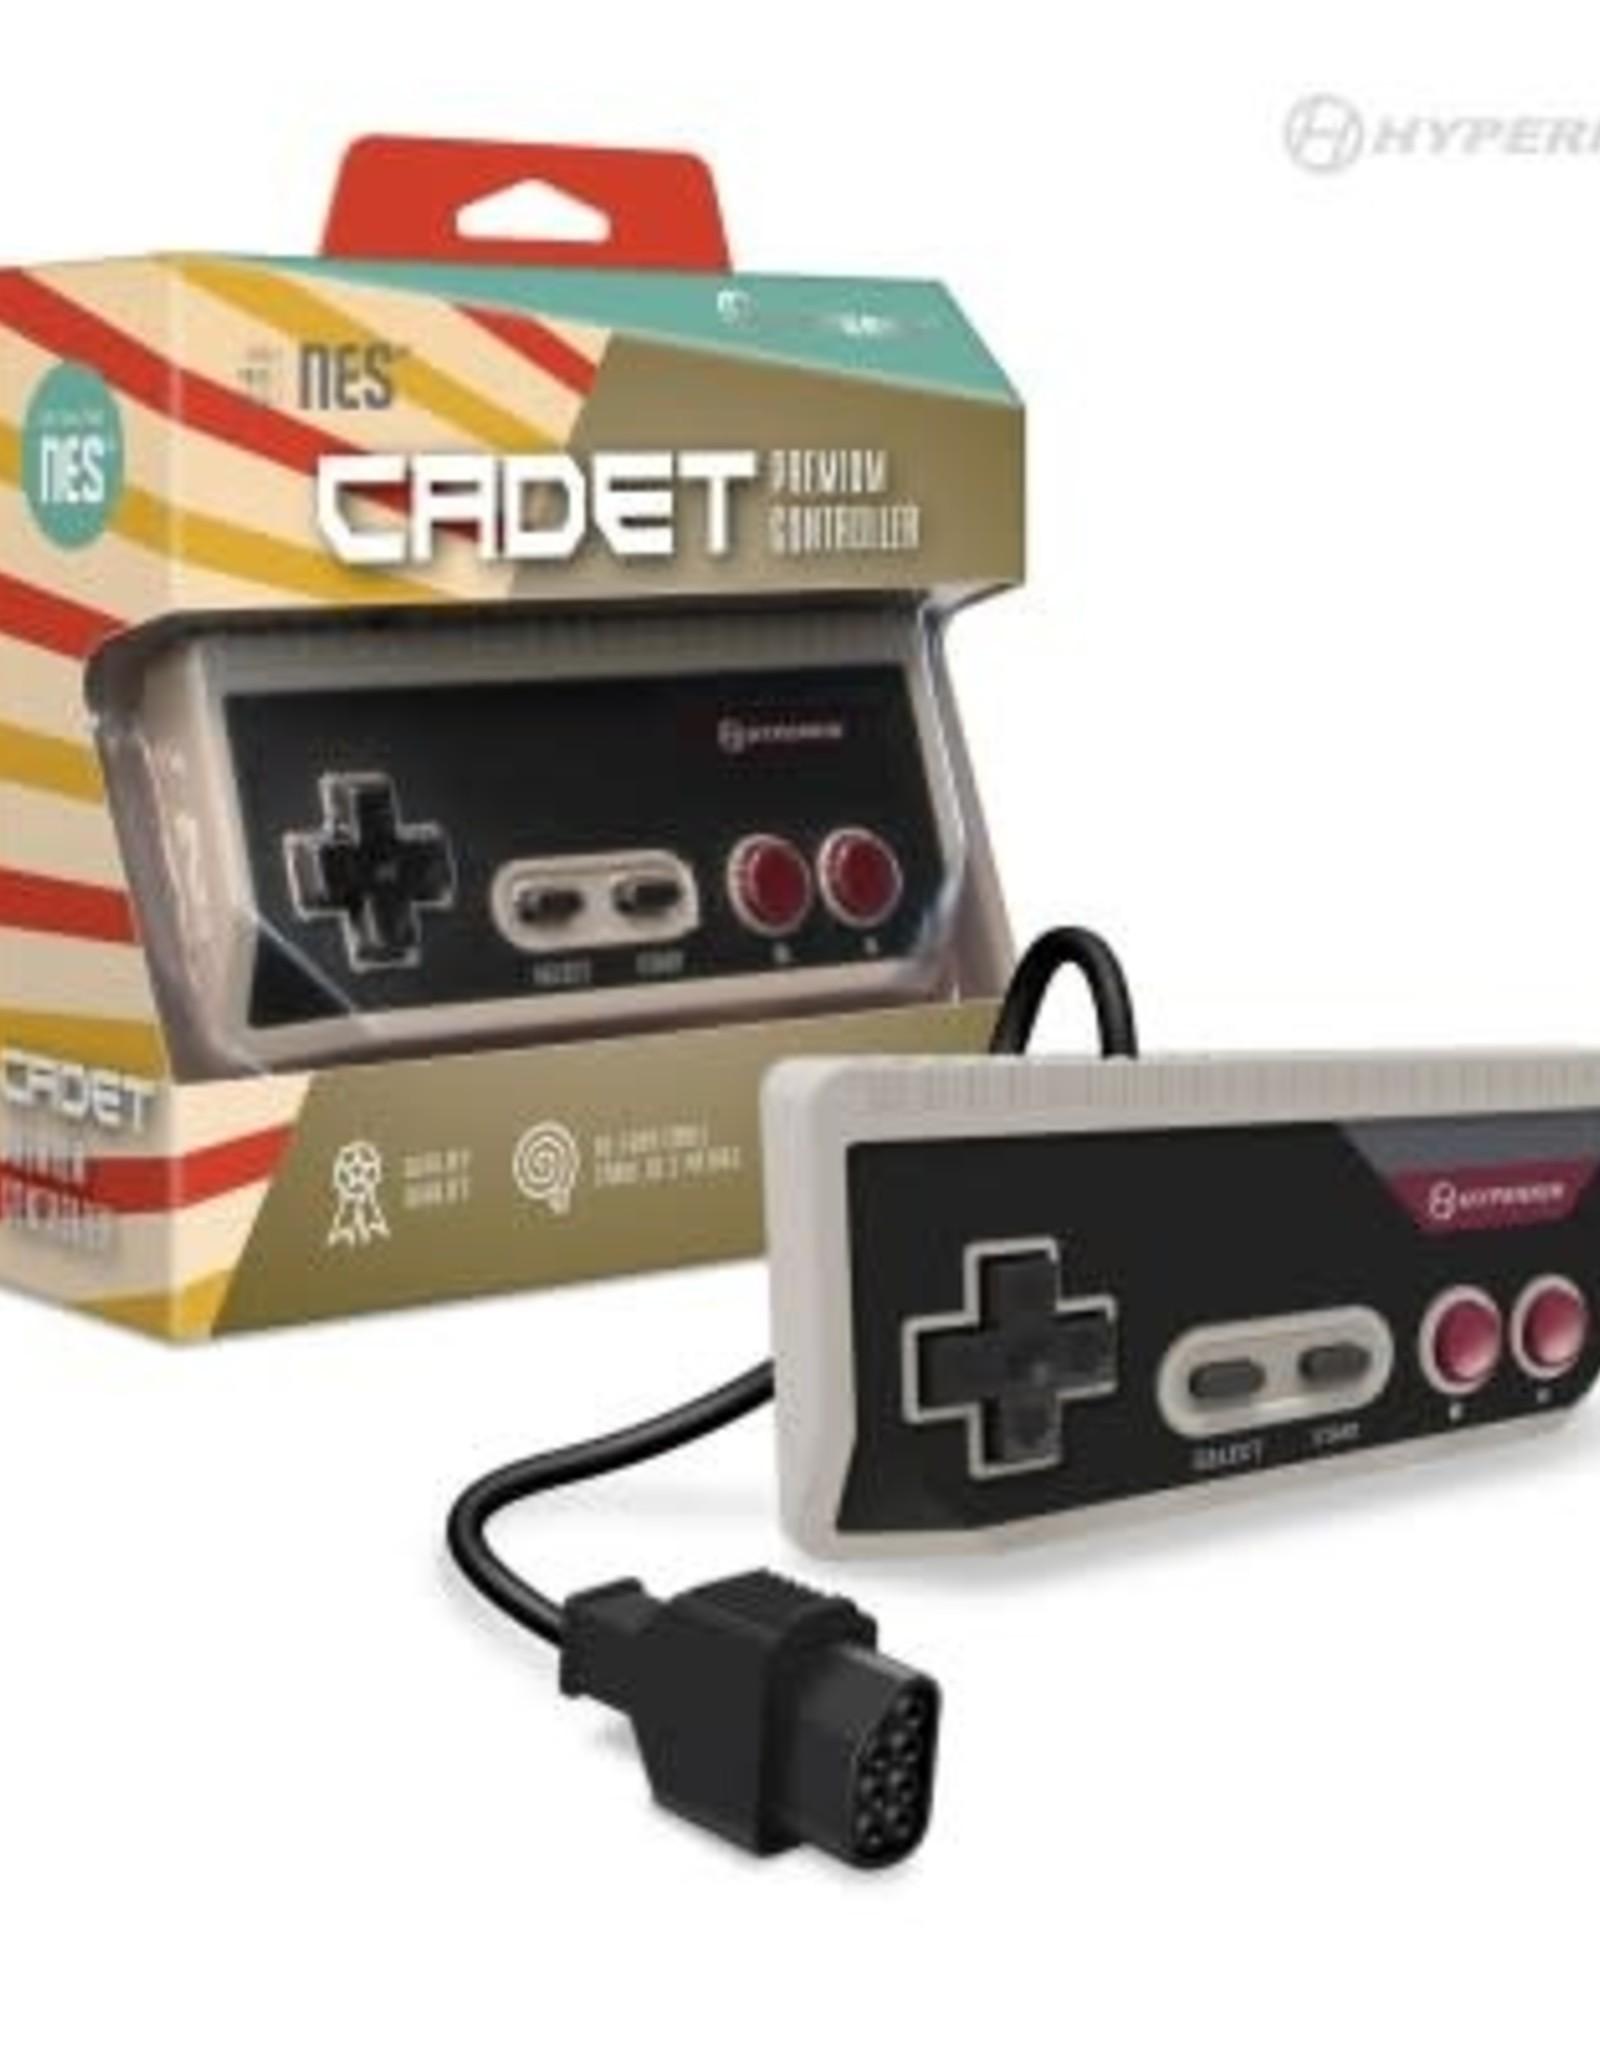 Hyperkin Cadet Wired NES Controller - Gray